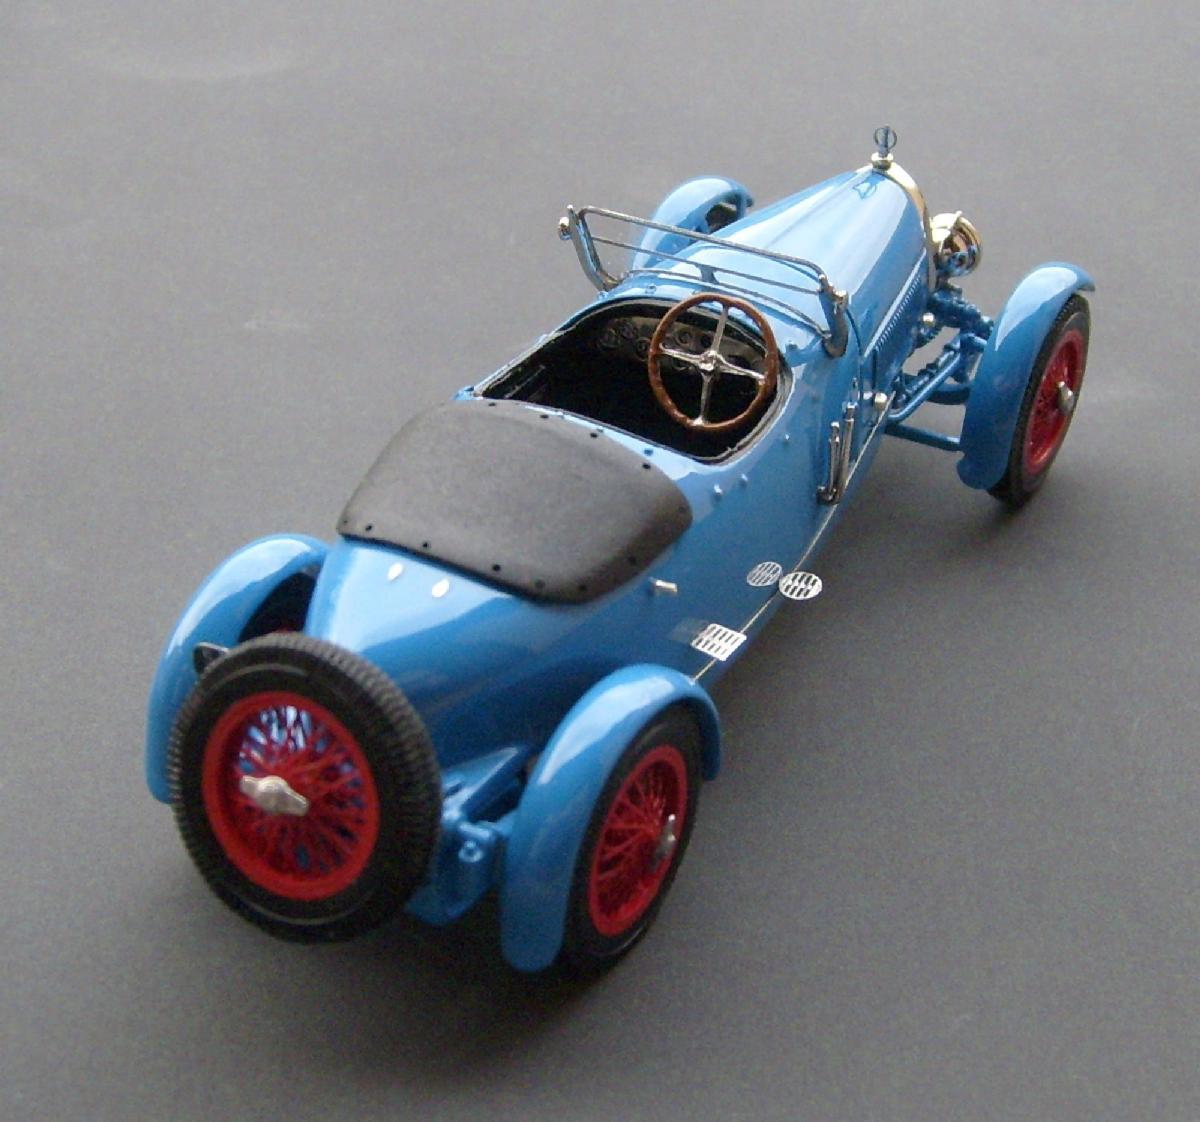 1:43 Nathalie Van Doren Bugatti T30